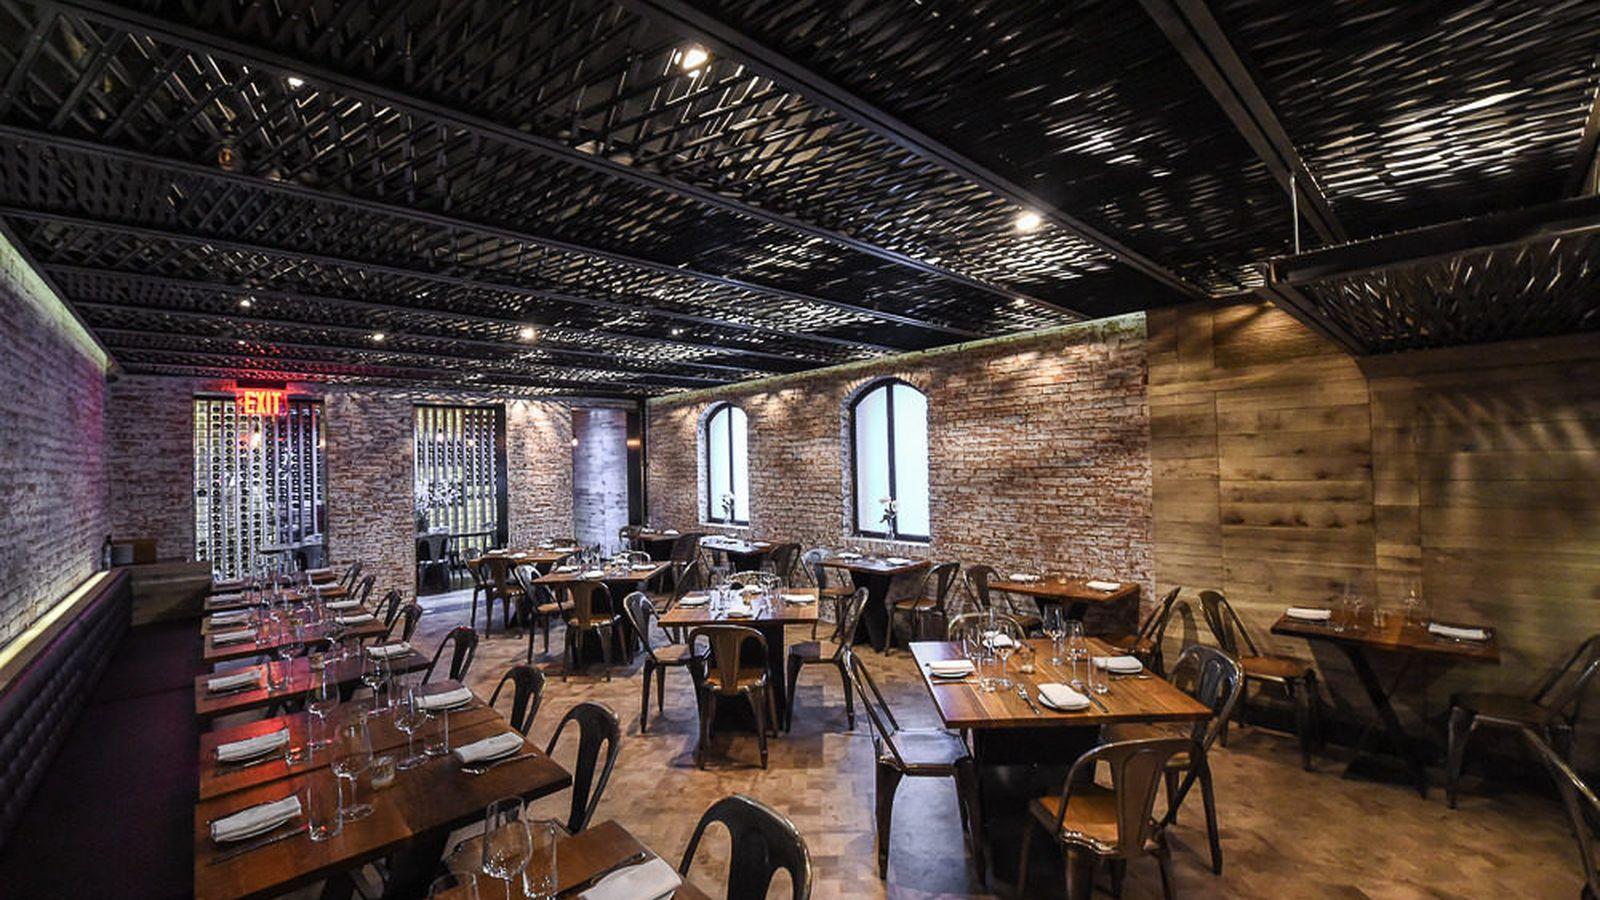 Tessa an upper west side mediterranean restaurant eater ny for T mobile upper west side